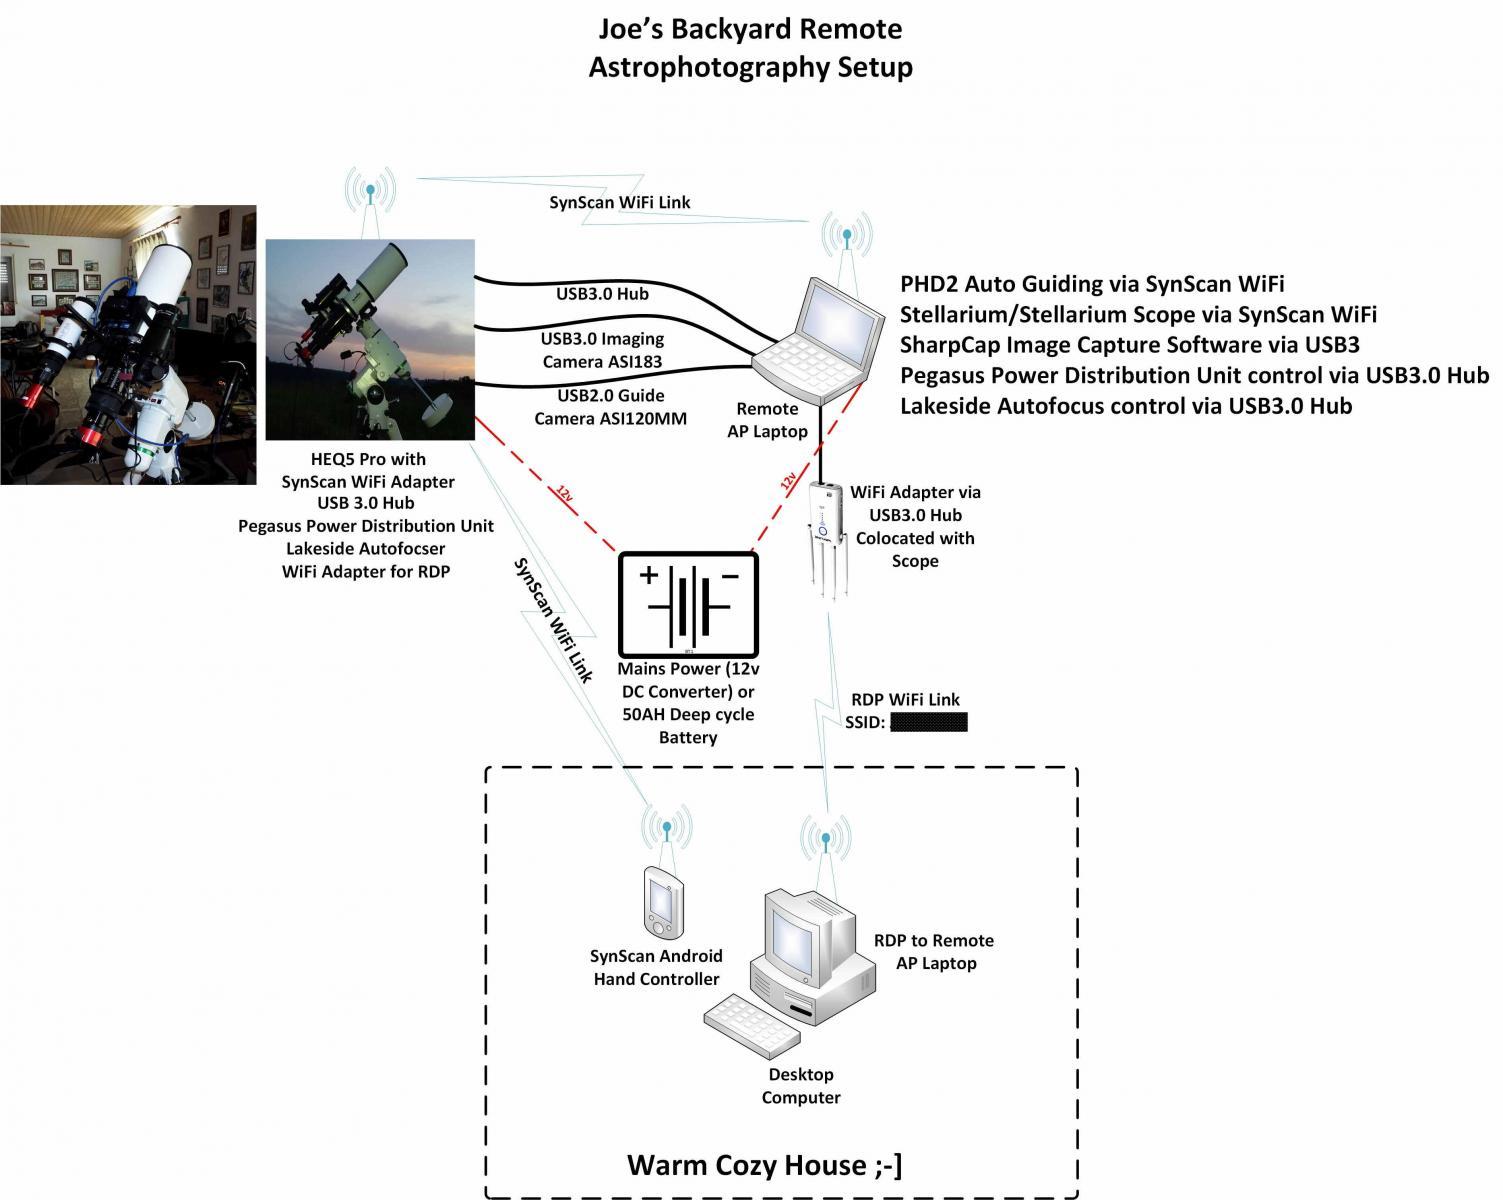 Remote Backyard EAA/AP Setup - EAA Observation and Equipment